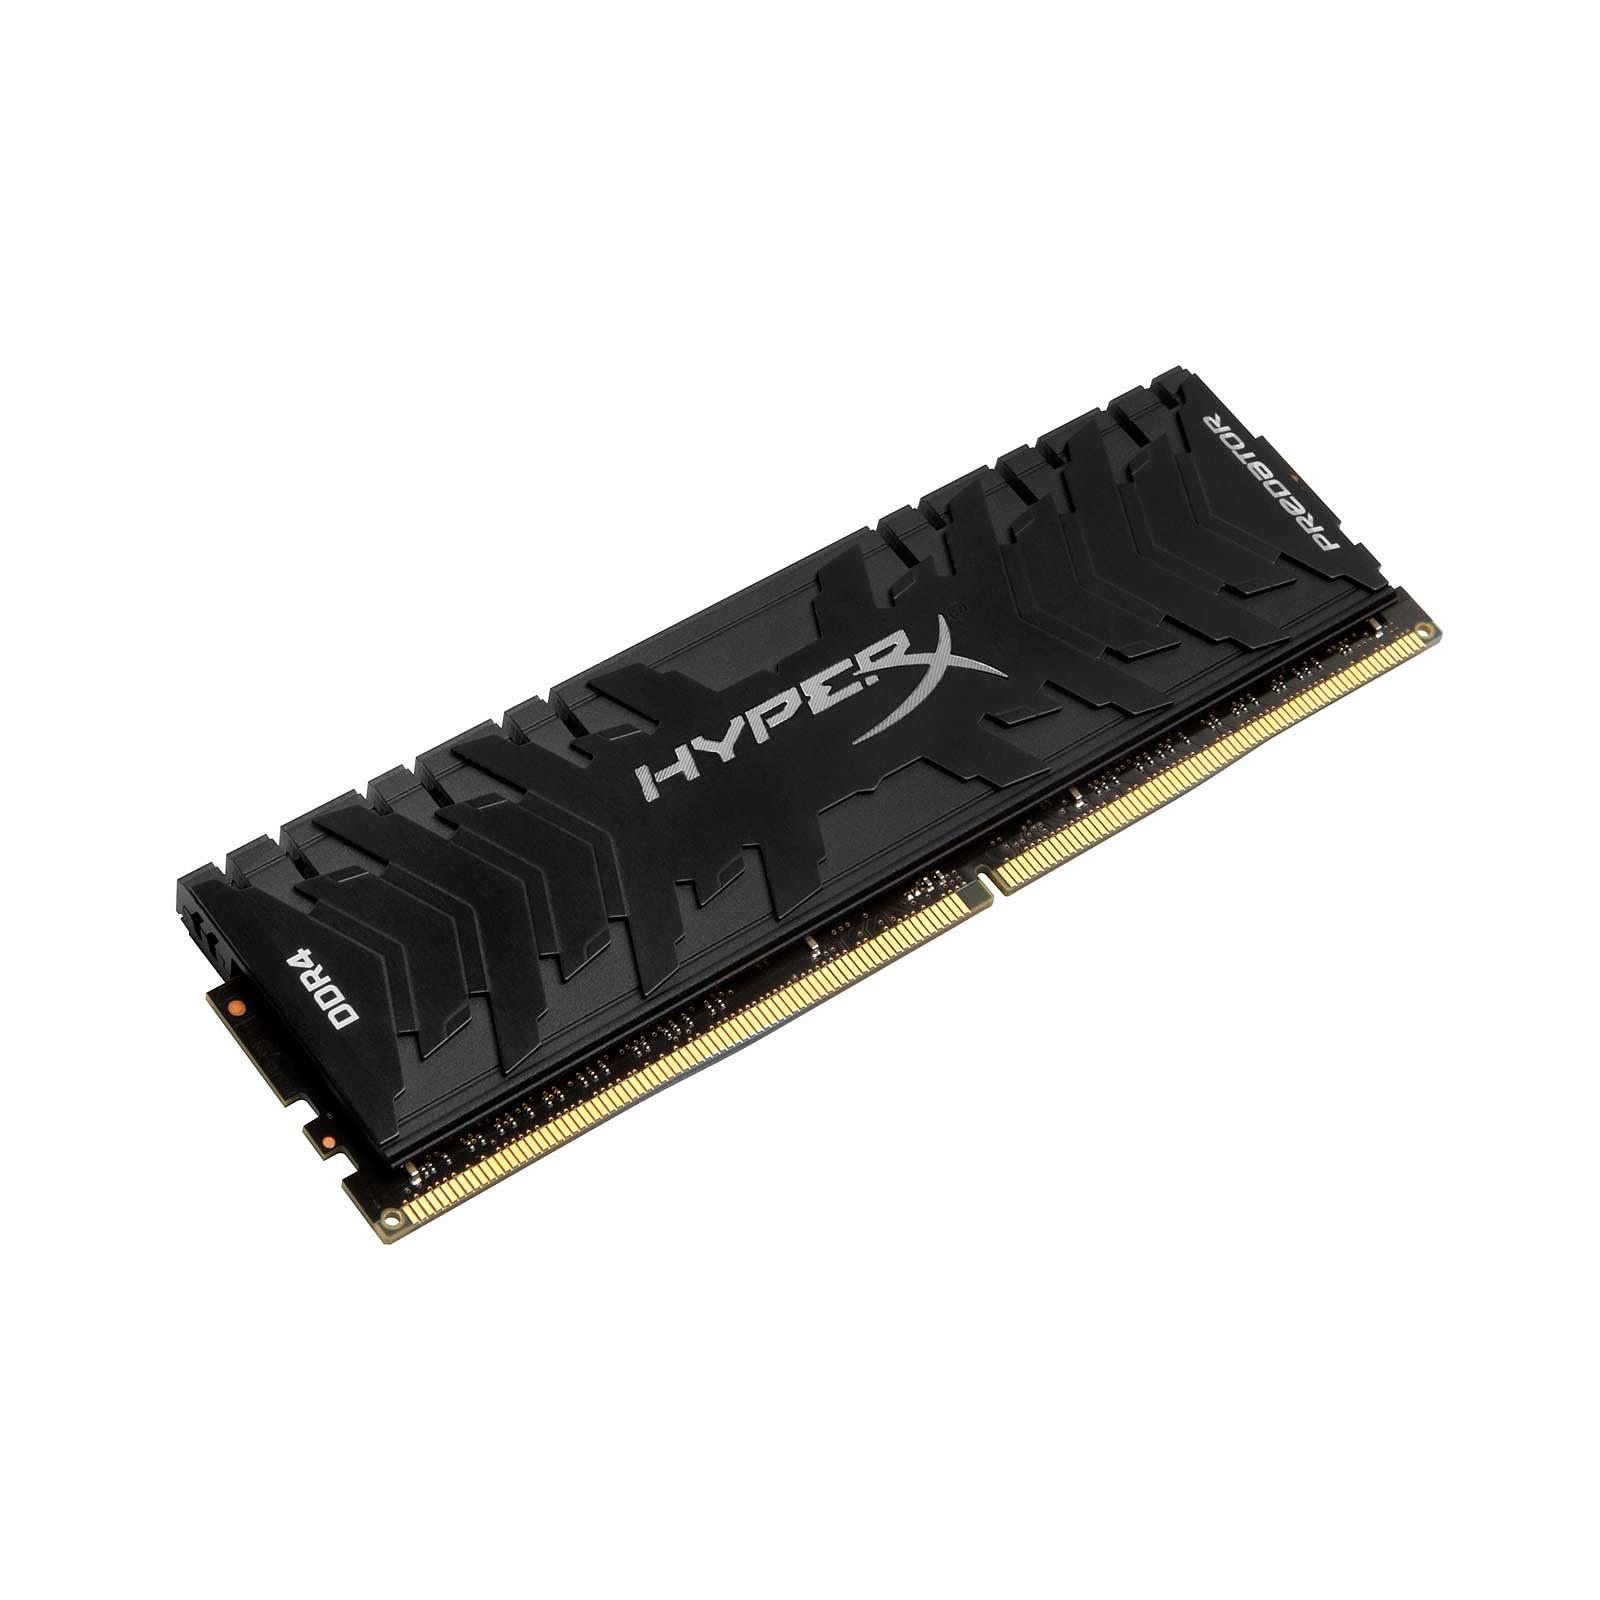 HyperX Predator Noir 8 Go DDR4 2666 MHz CL13